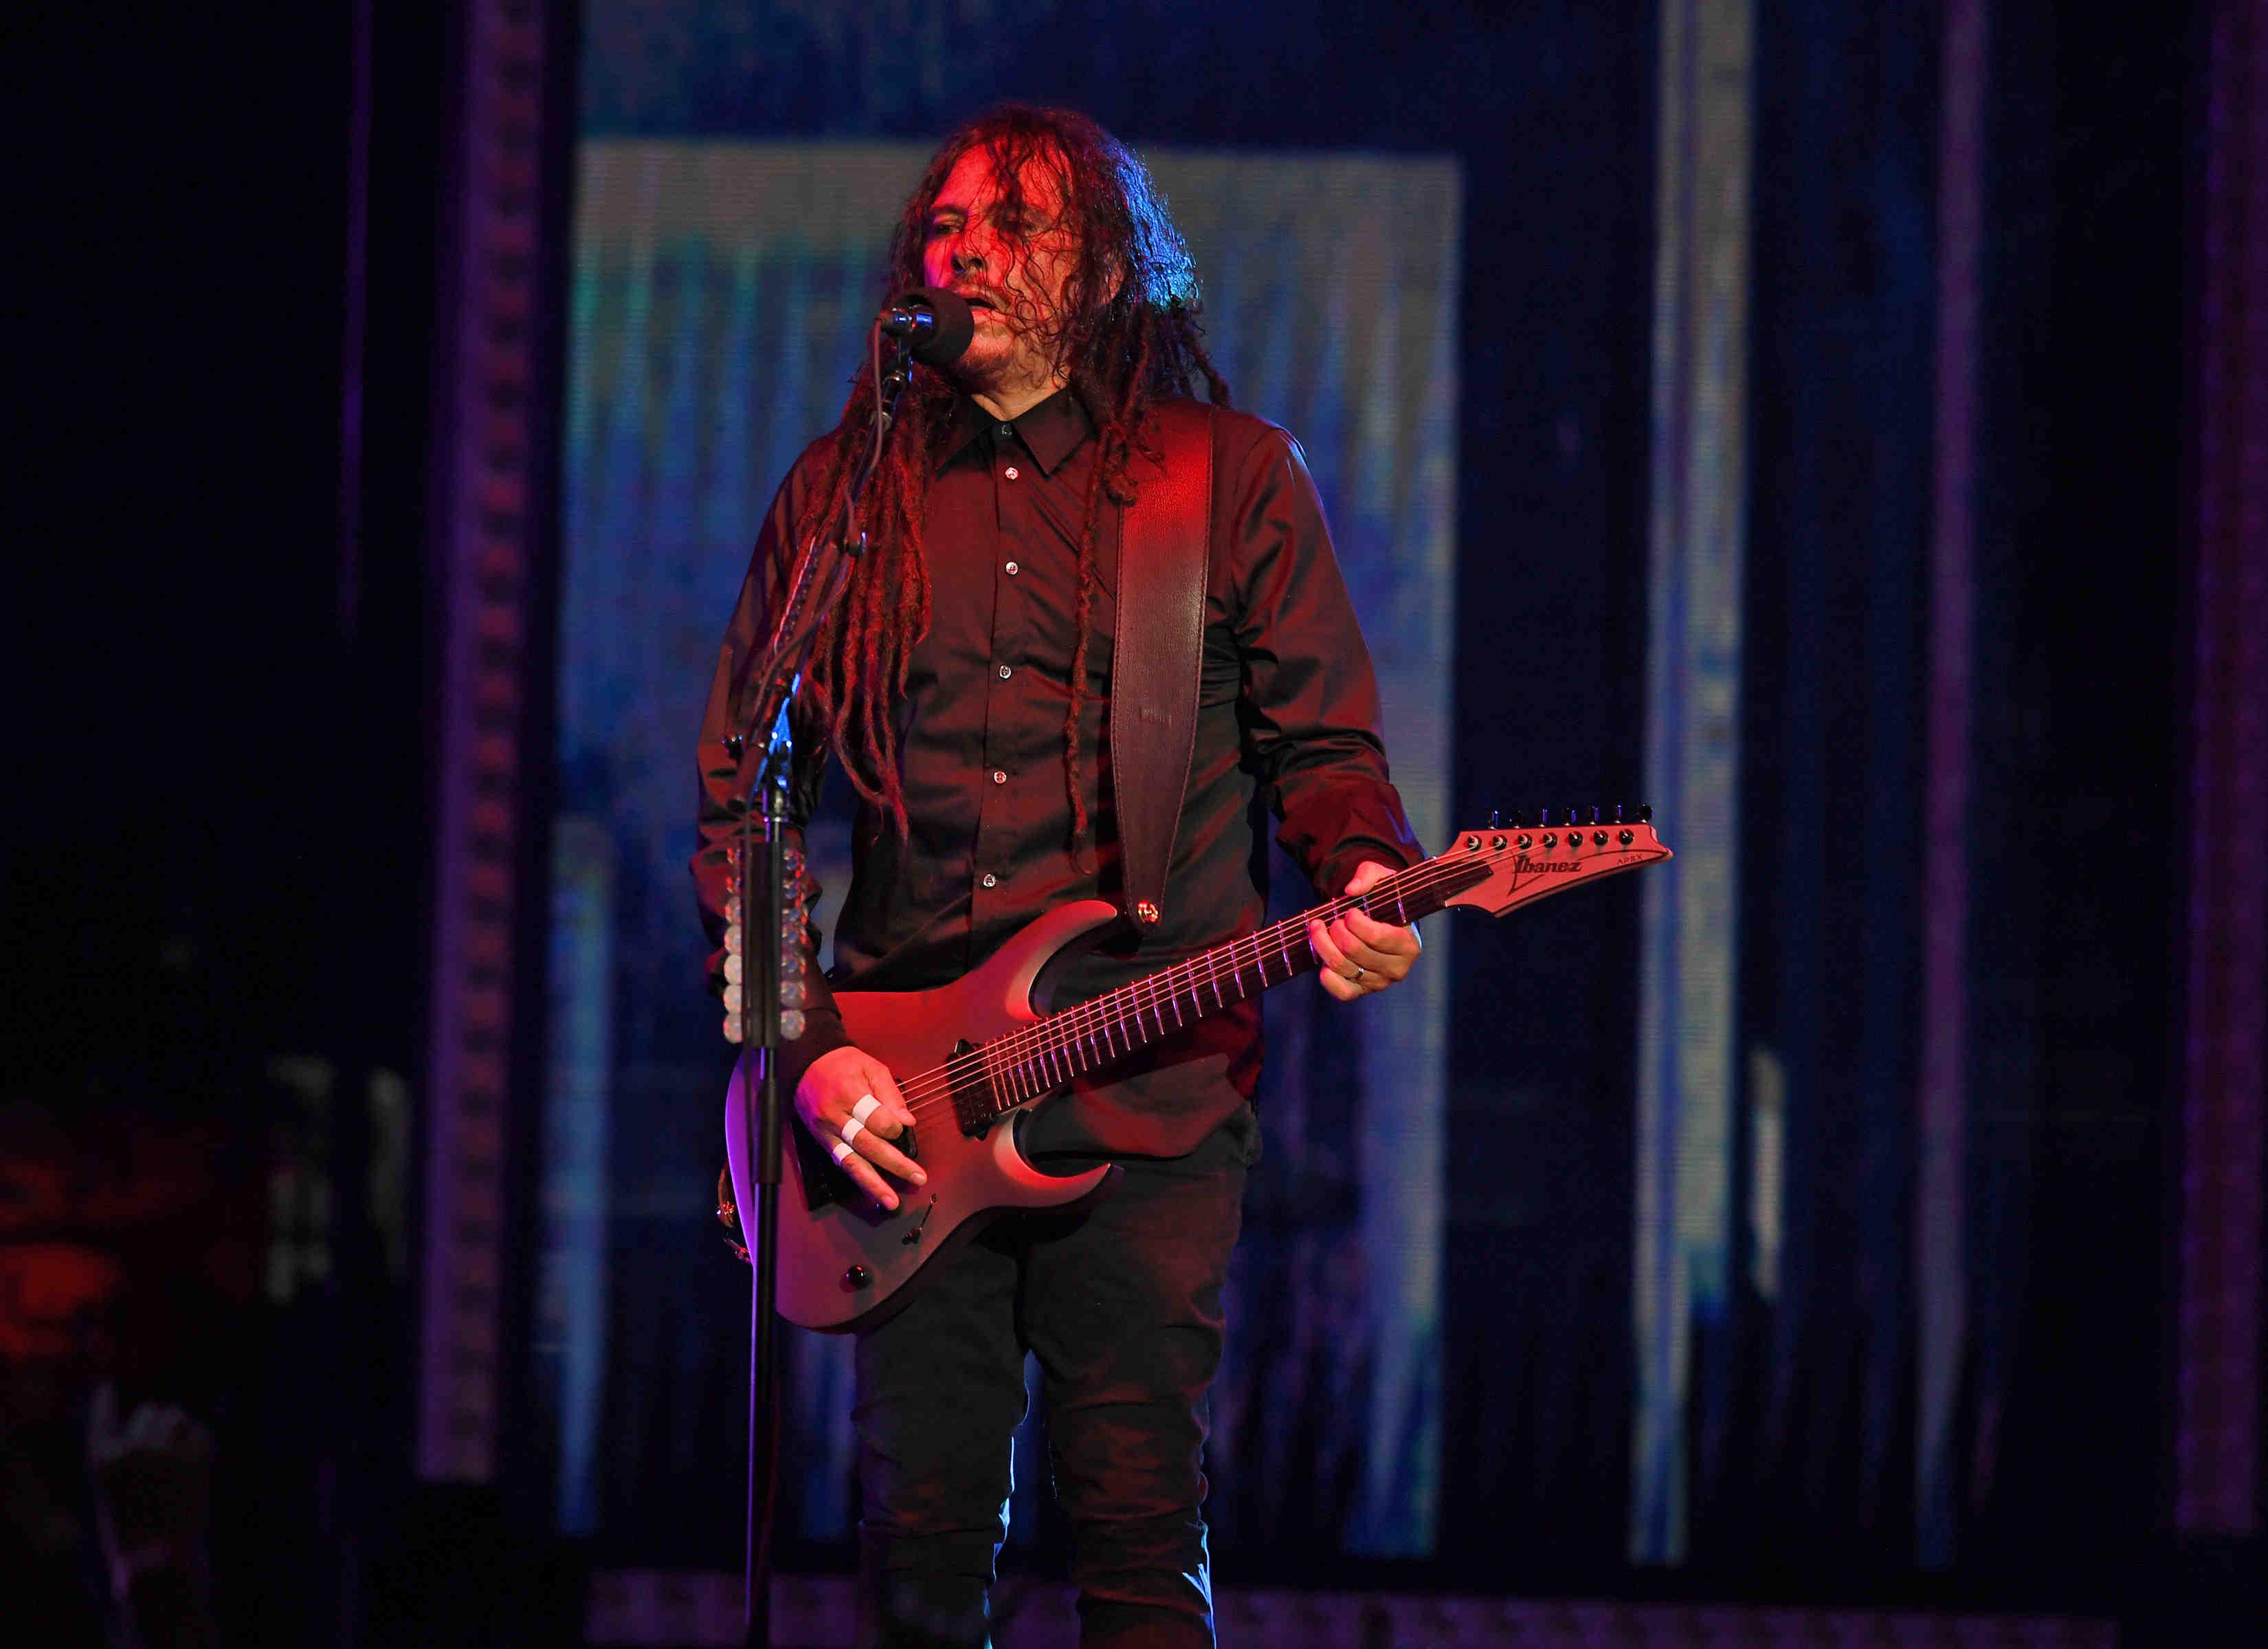 Korn Tour 2021 in West Palm Beach, Florida.